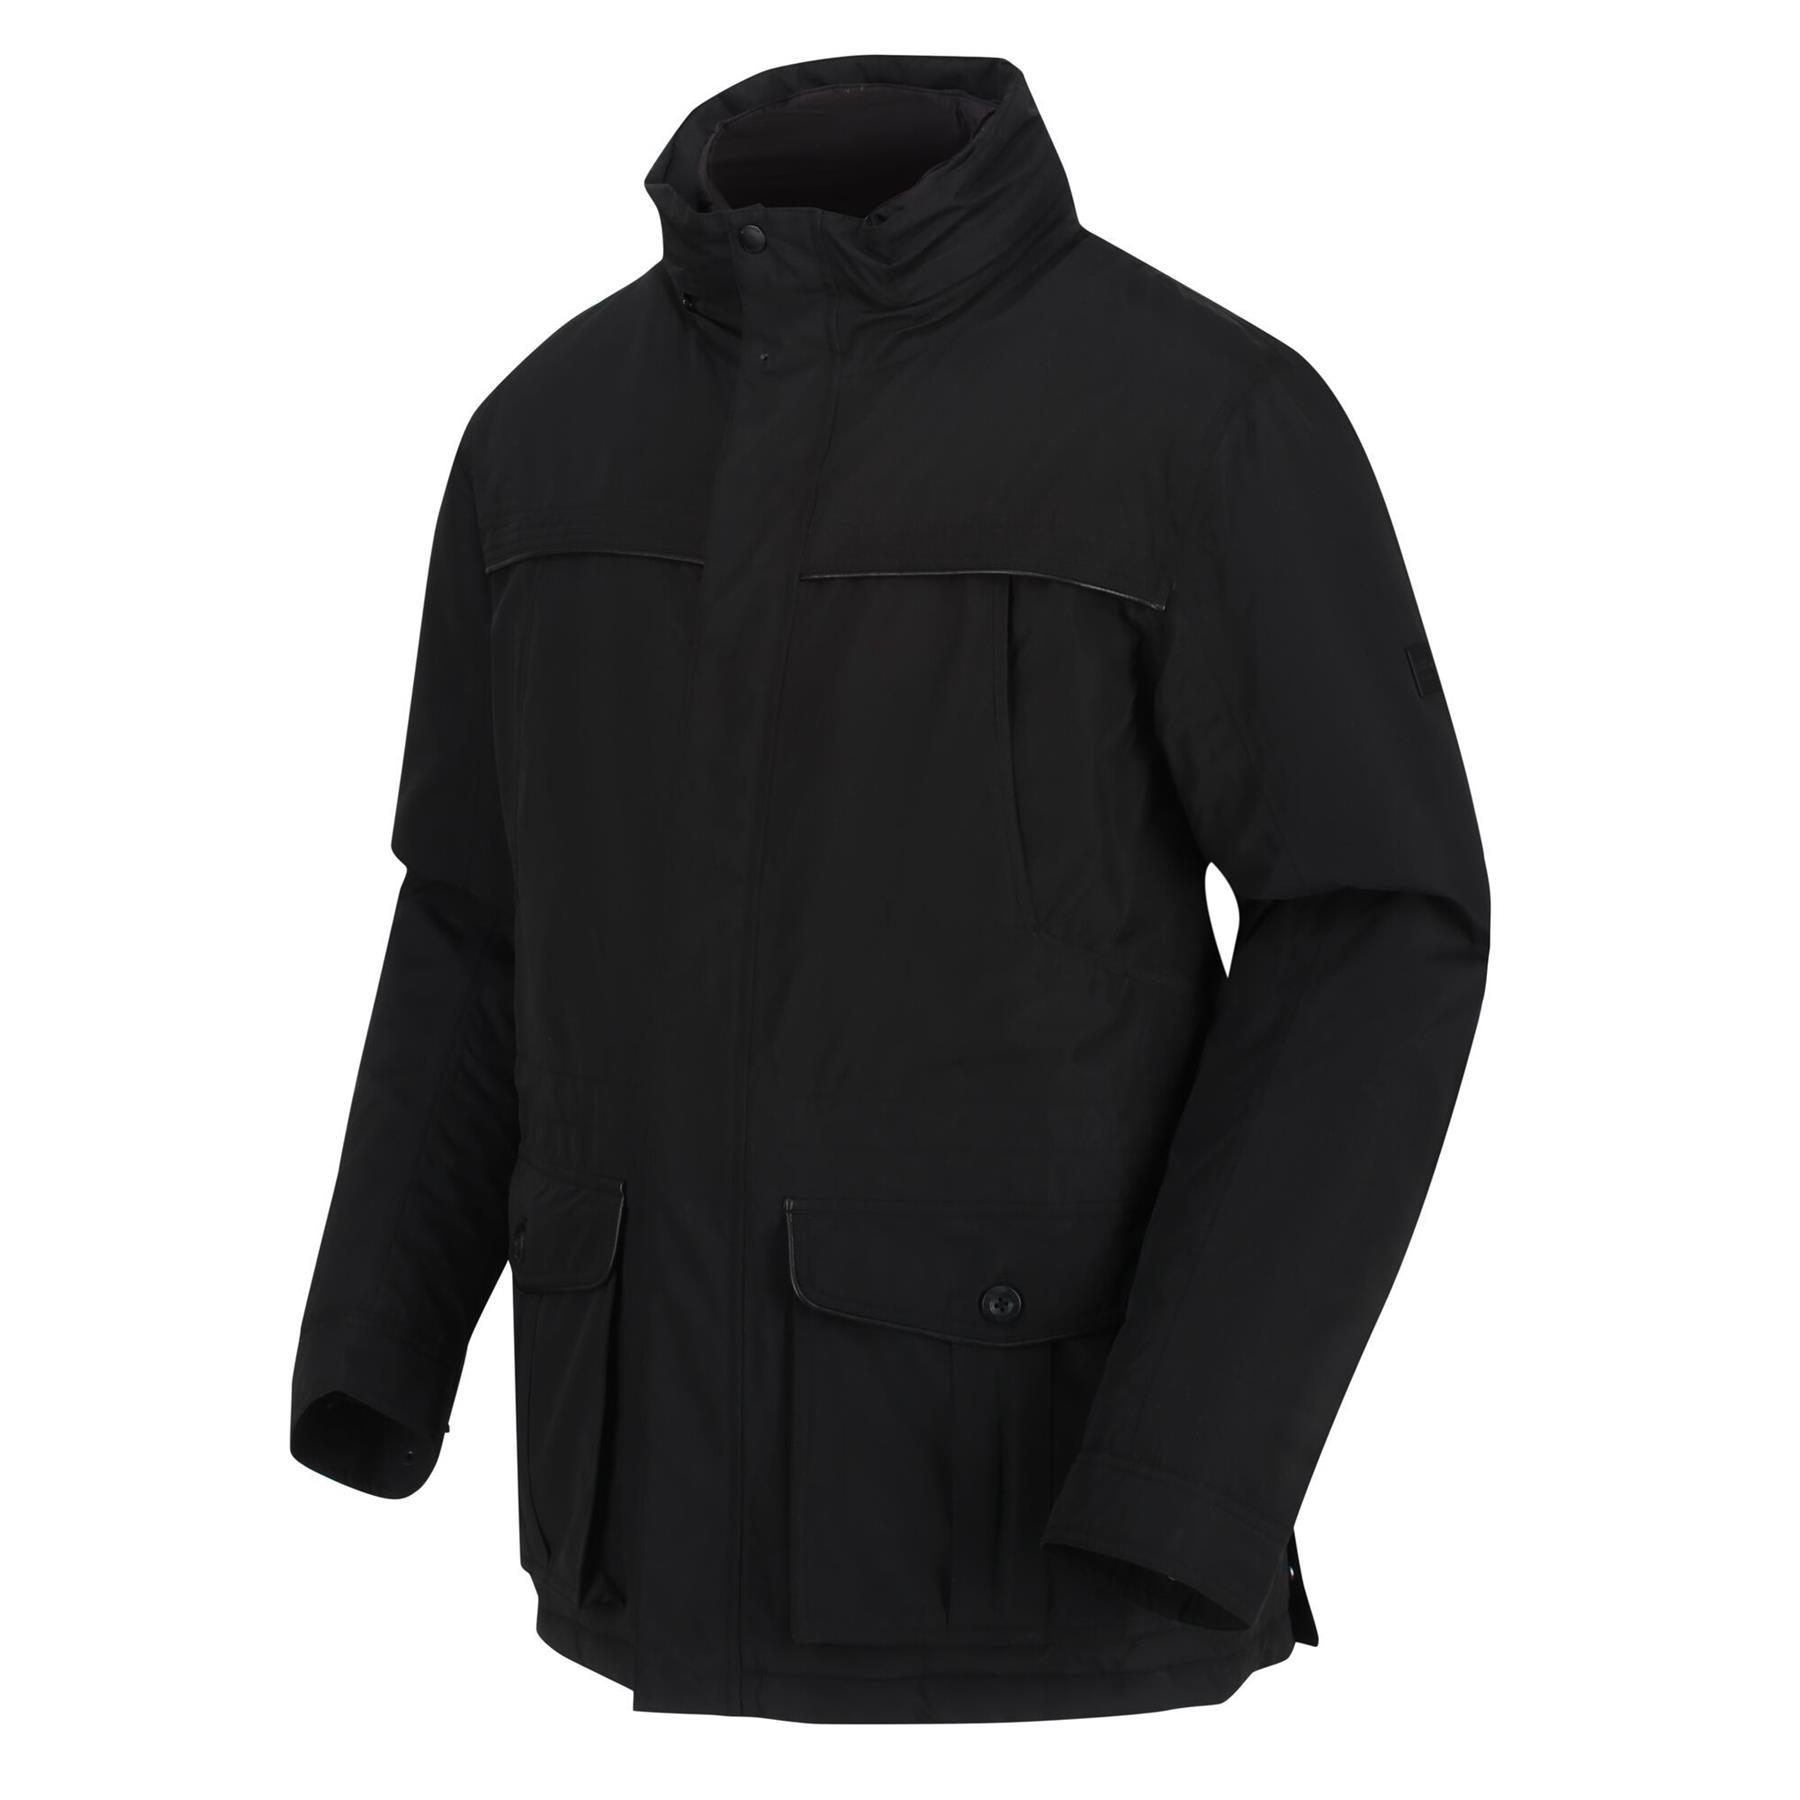 miniatuur 8 - Regatta Mens Rawson Waterproof Breathable Insulated Jacket Coat